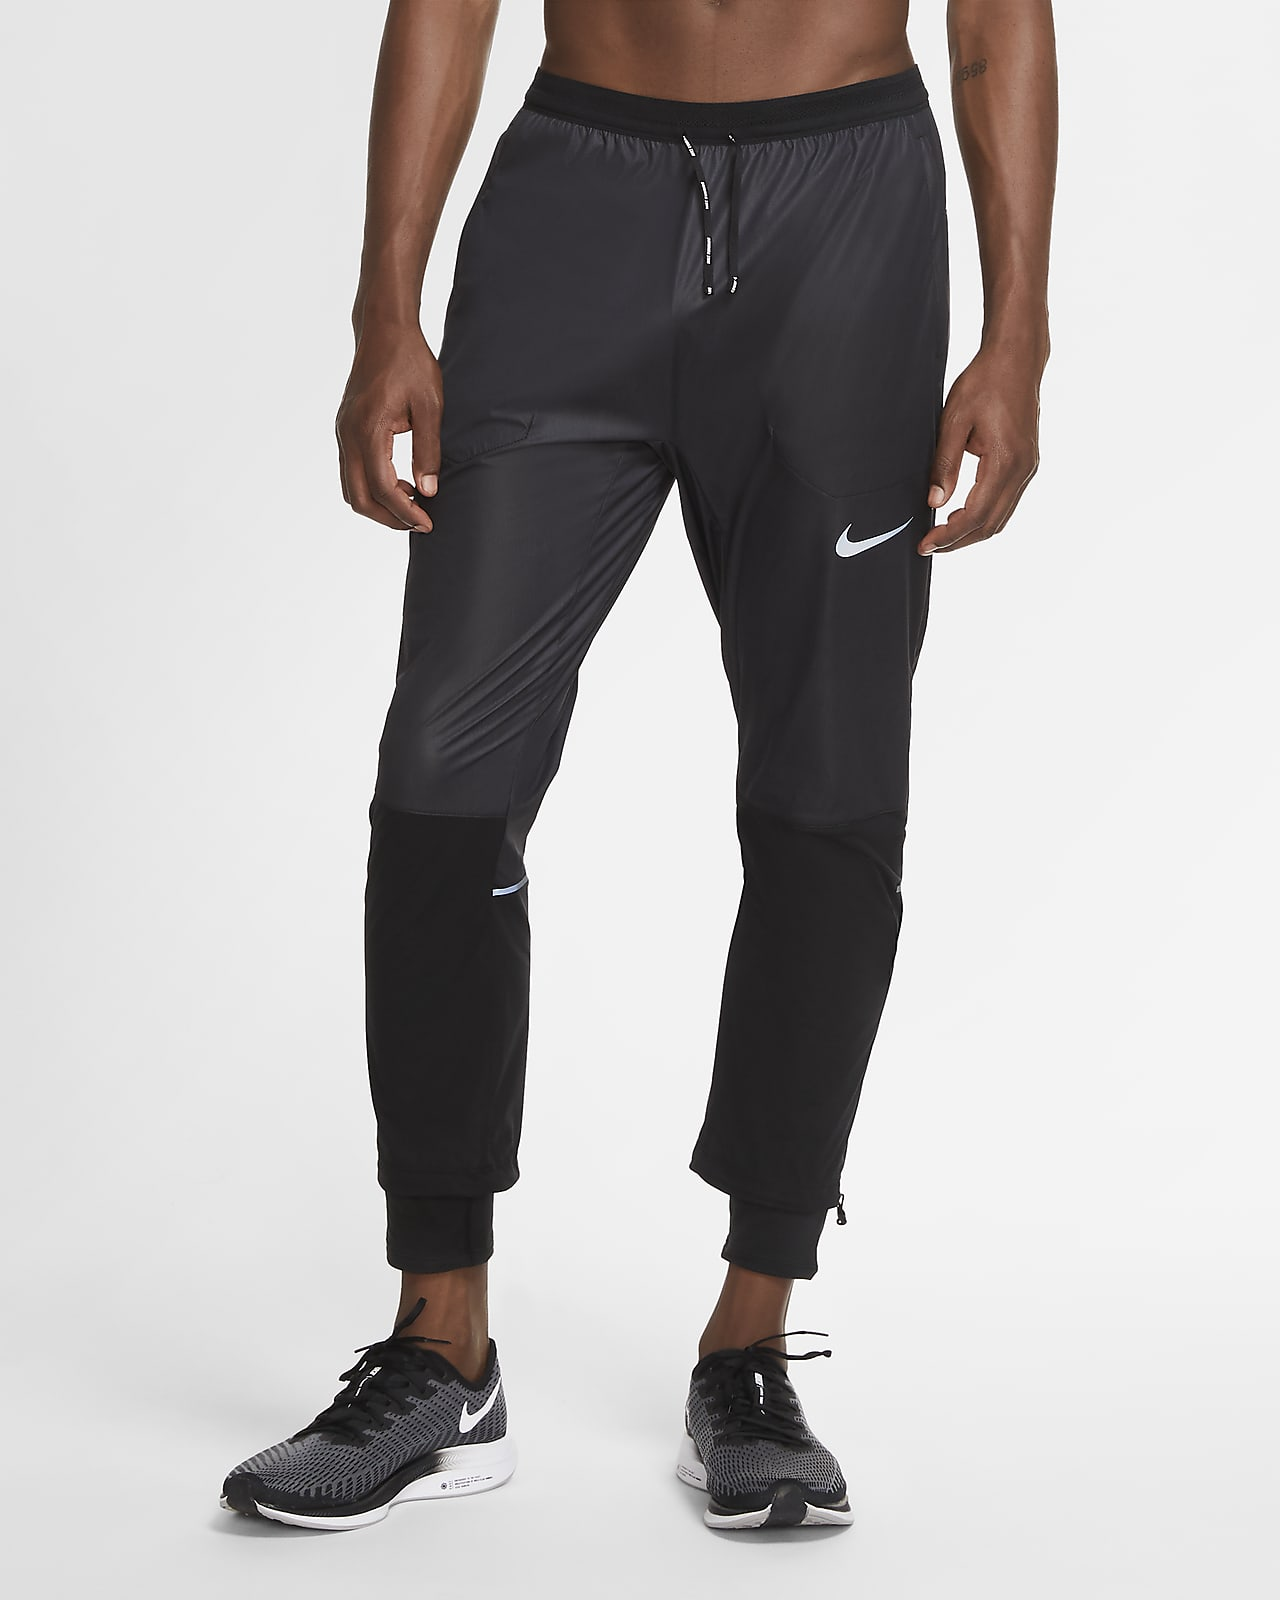 Pantaloni da running Nike Swift Shield - Uomo